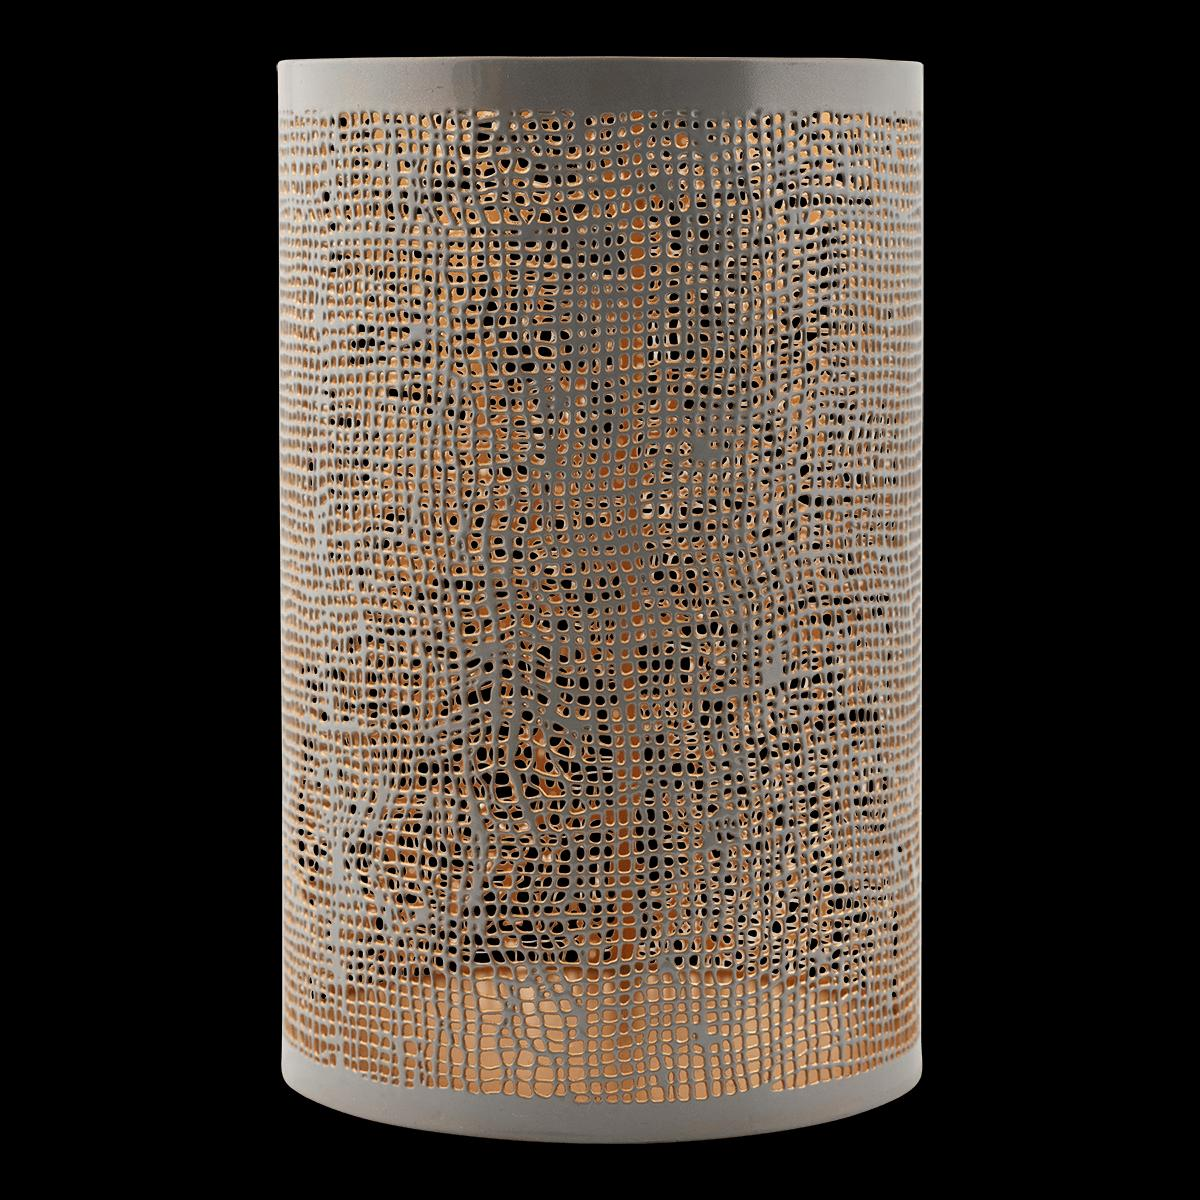 Sada 6 ks − Šedozlaté tienidlo na sviečku Hessian veľké